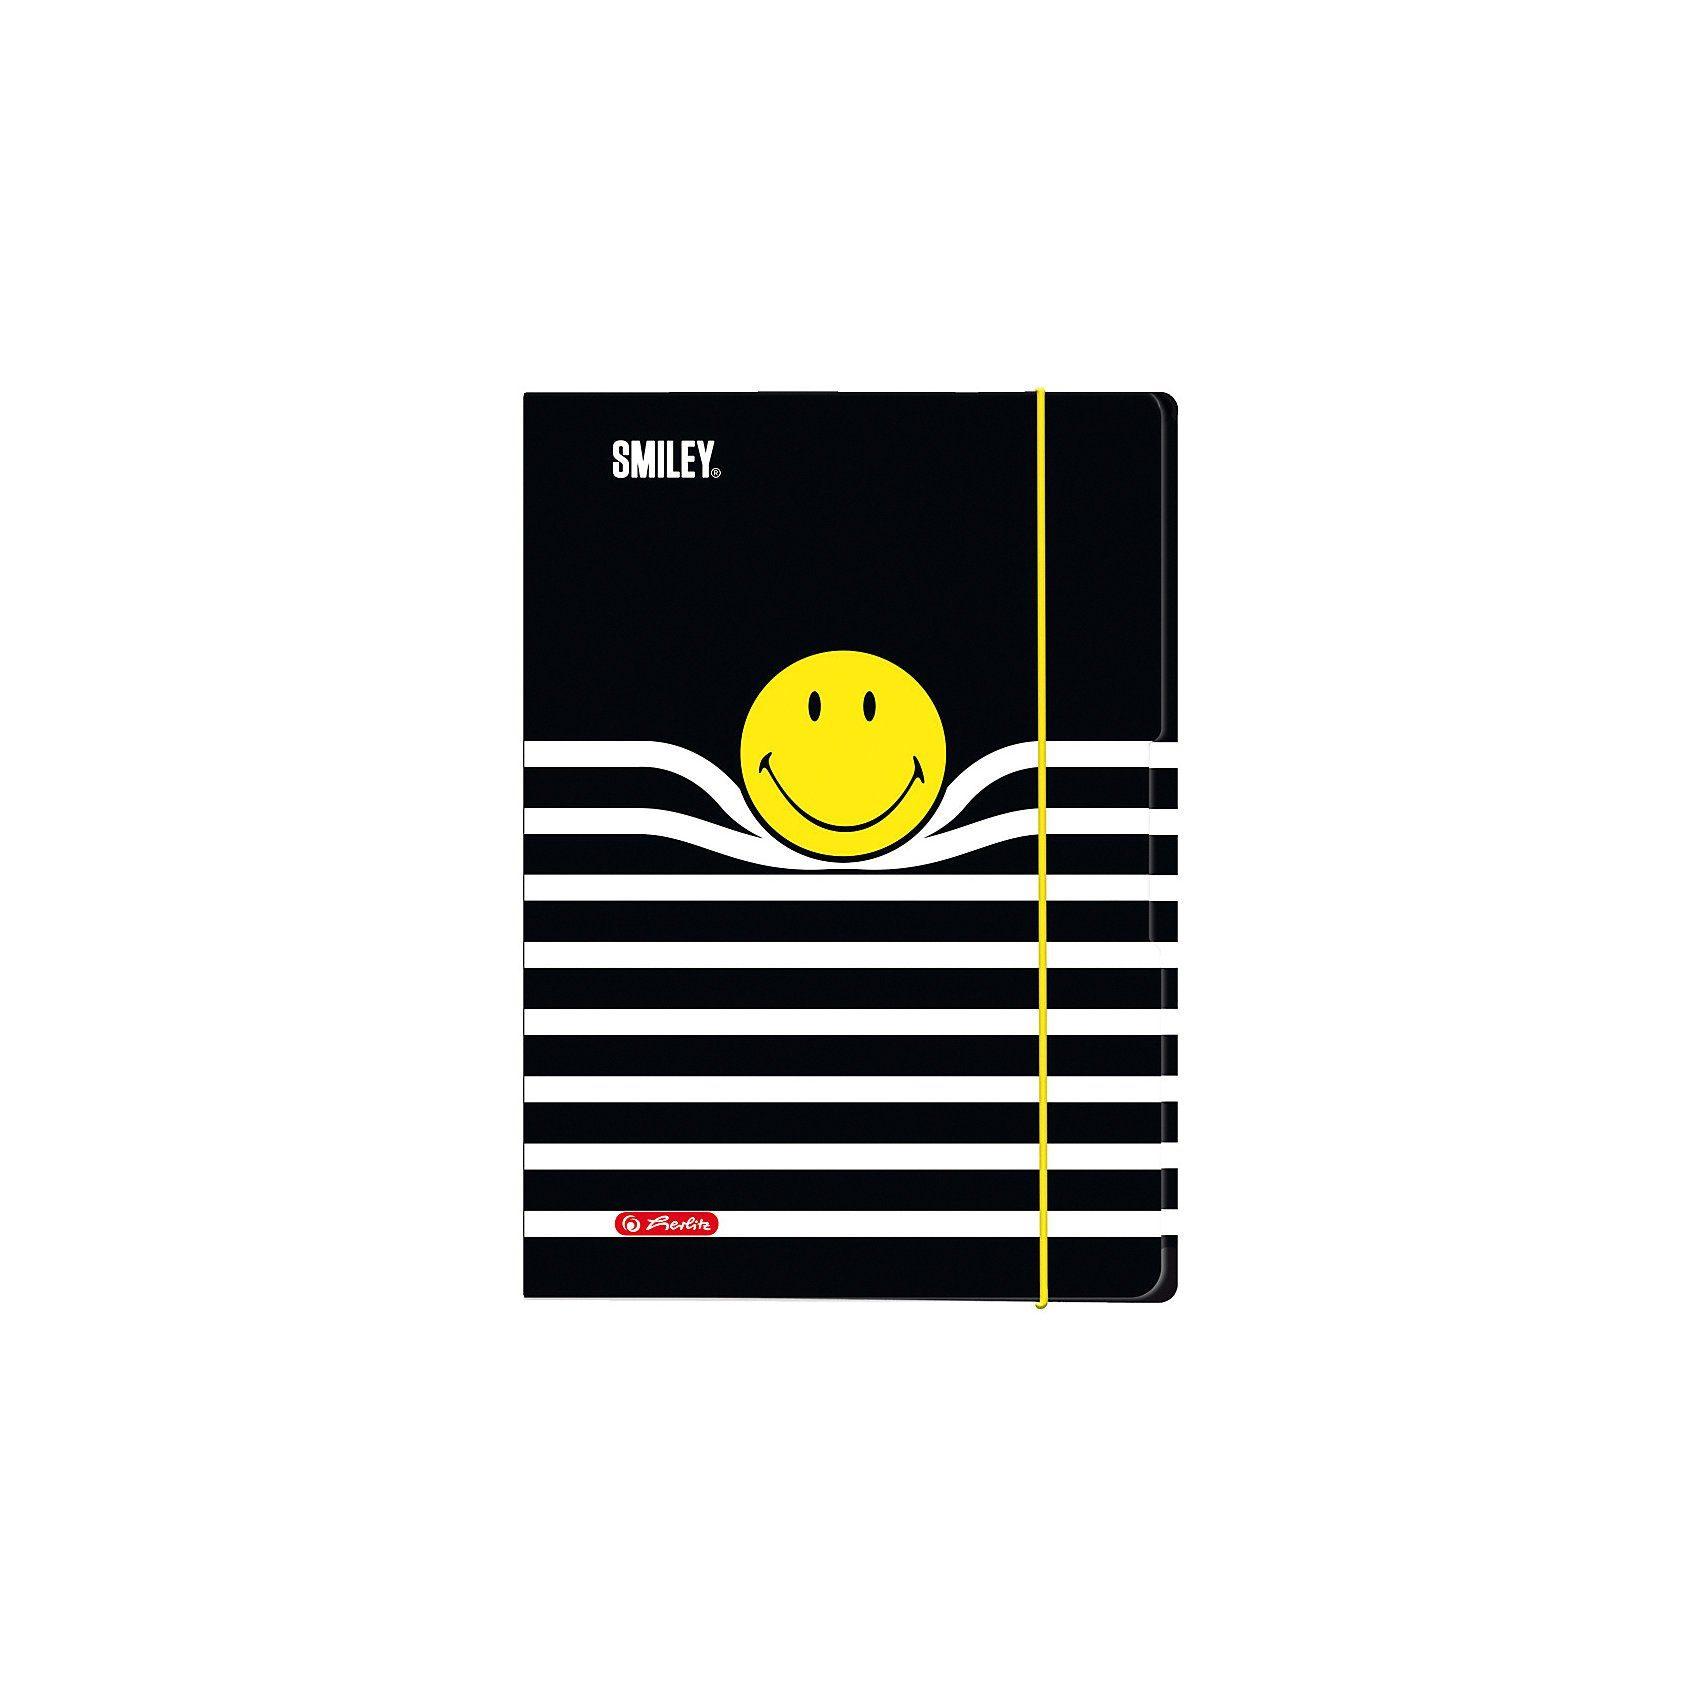 Sammelmappe/Zeichenmappe A3 Smiley B&Y Stripes